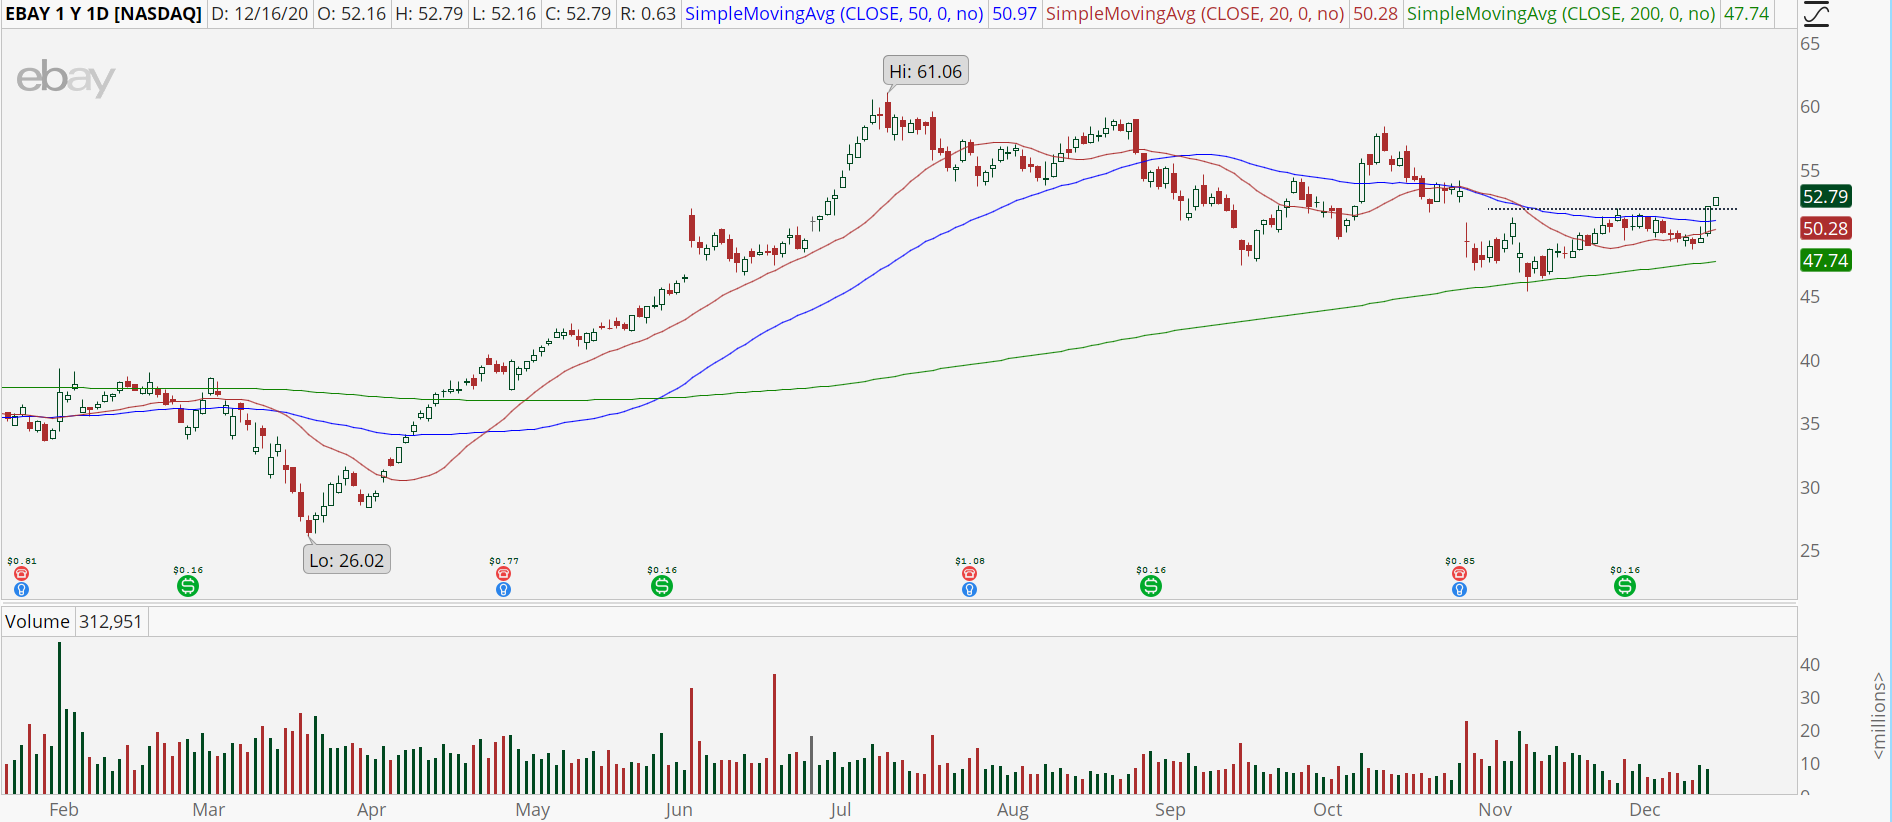 eBay (EBAY) chart with upside trend reversal